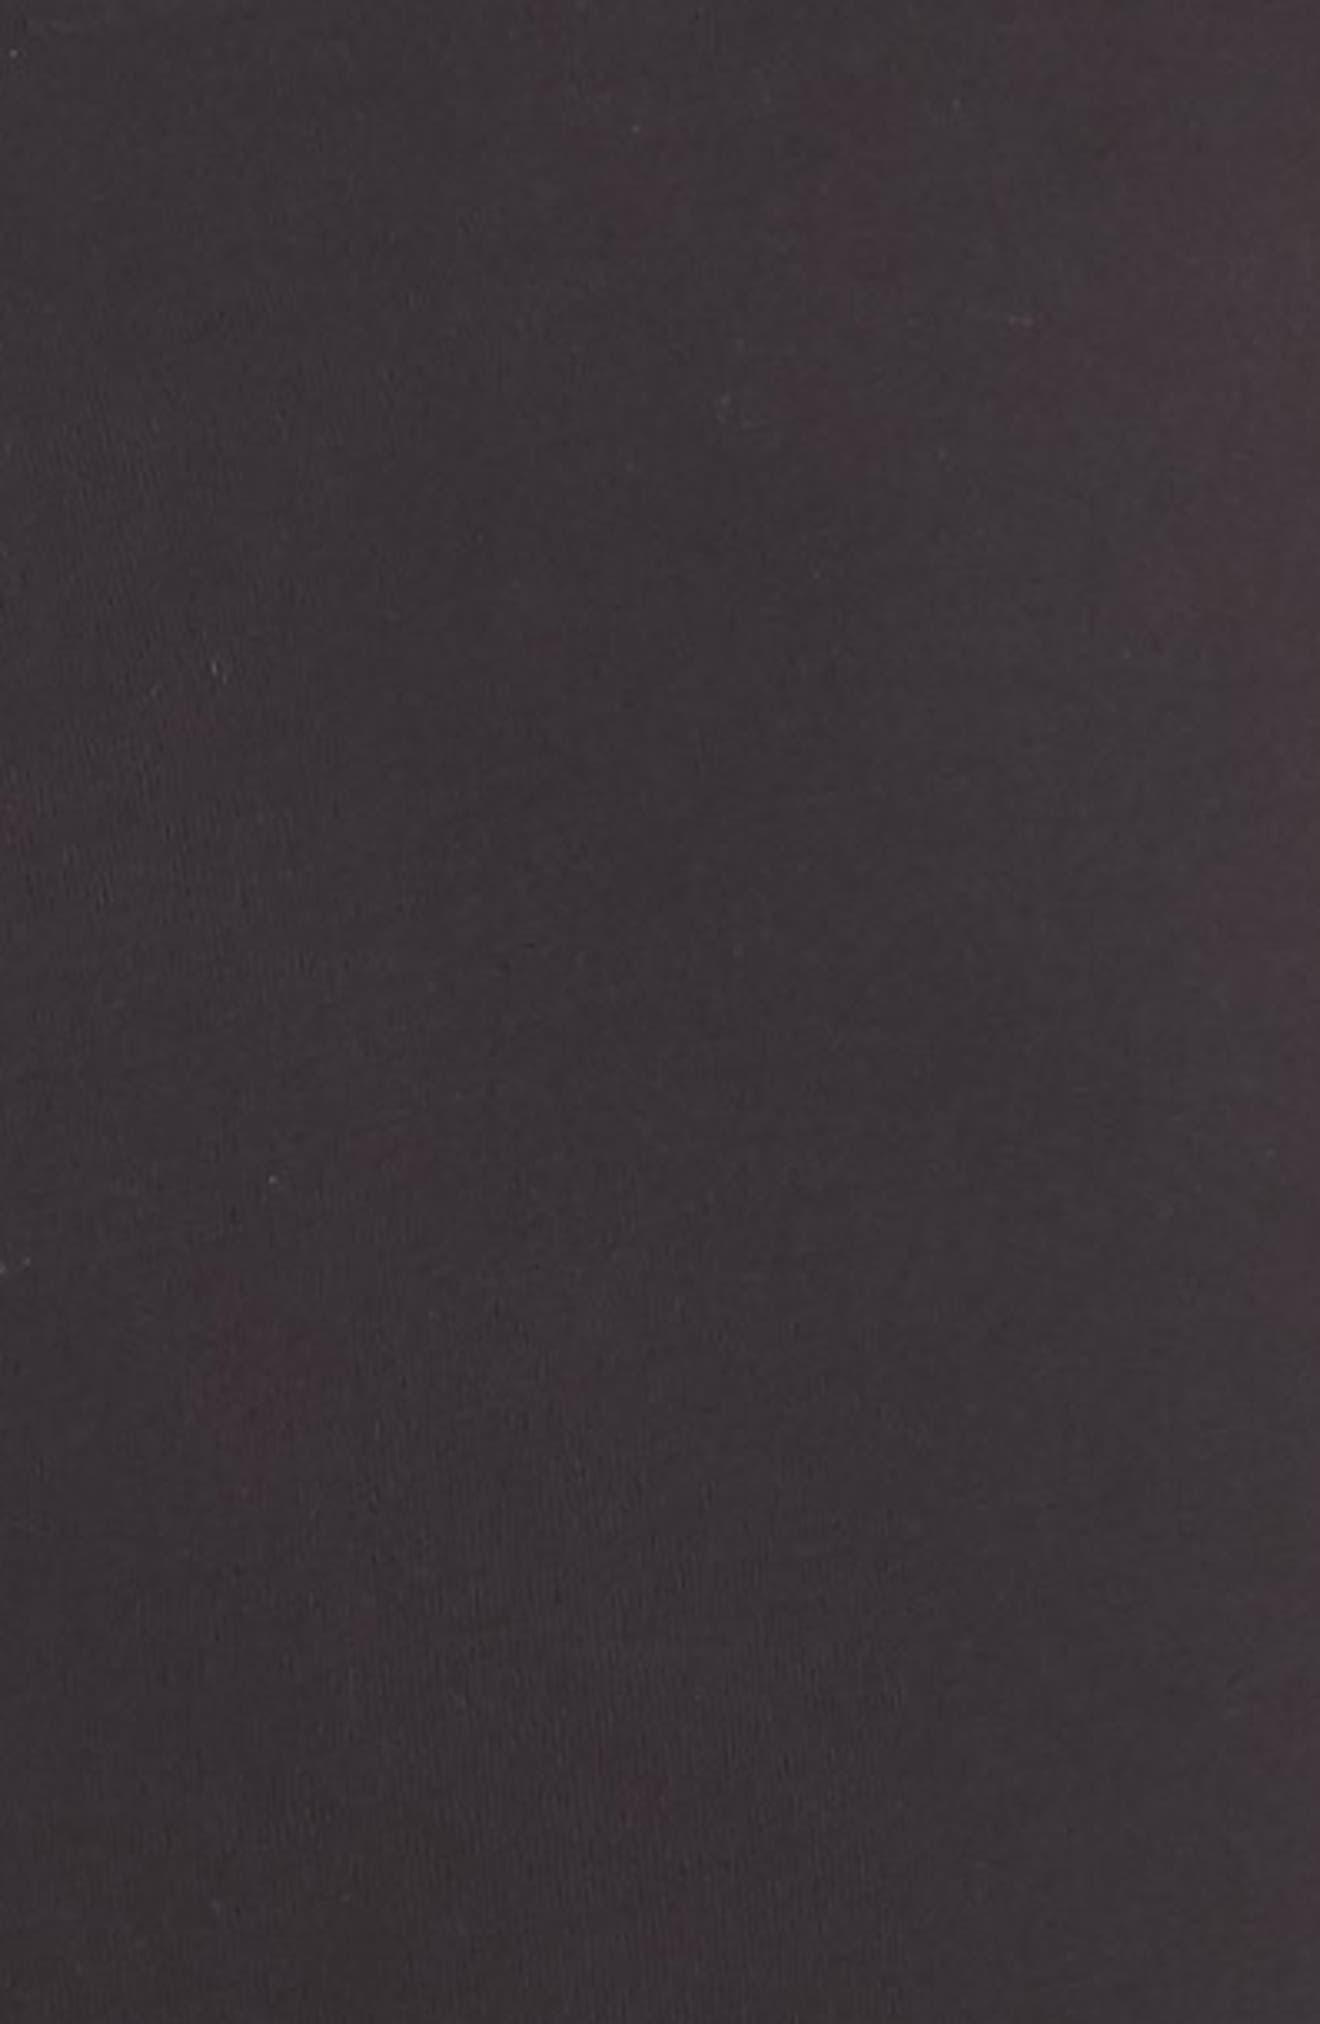 Aden Ruffle Hem Lounge Pants,                             Alternate thumbnail 5, color,                             BLACK